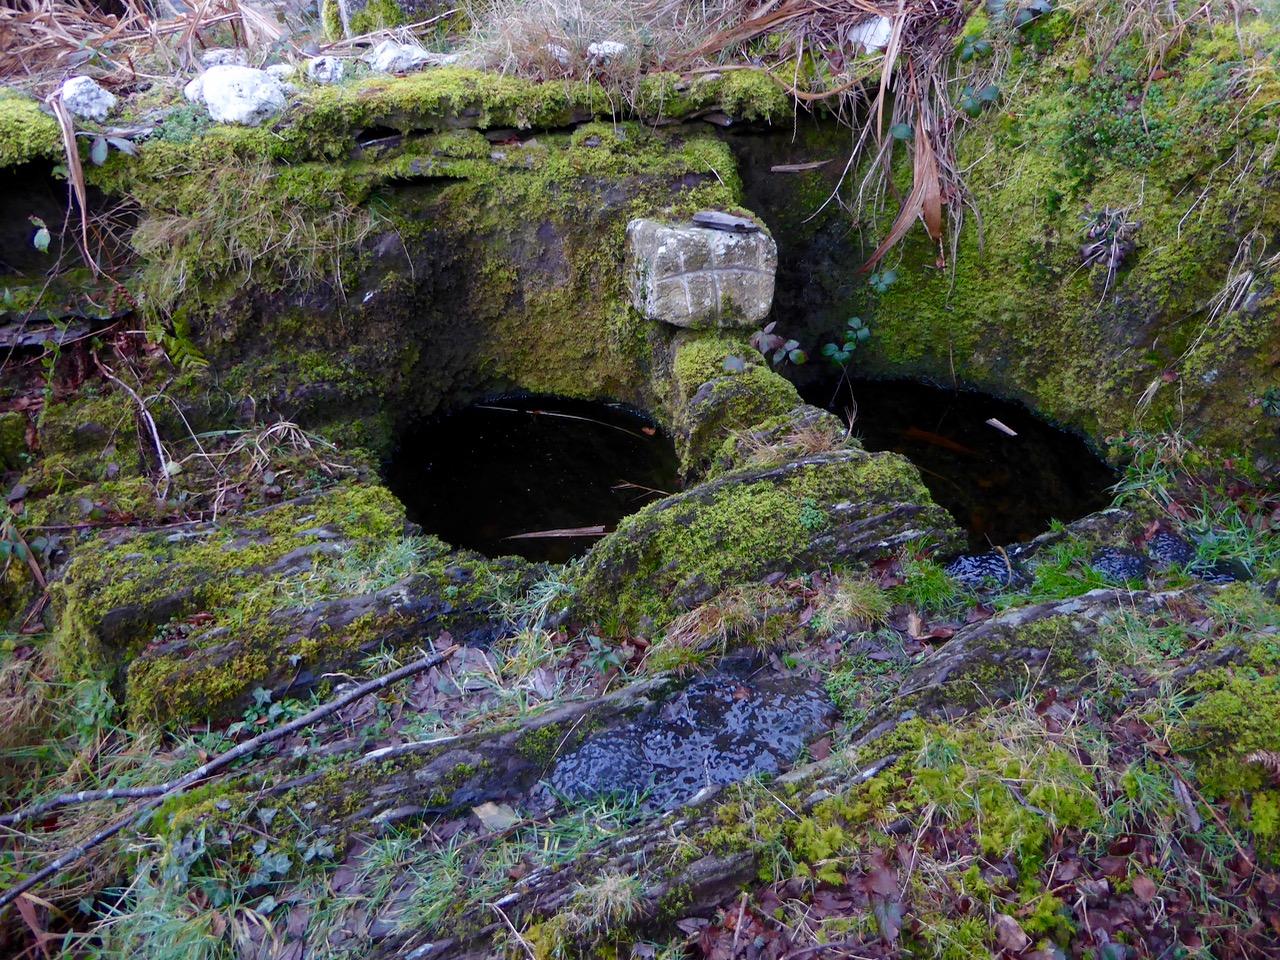 St Lachtan's holy well